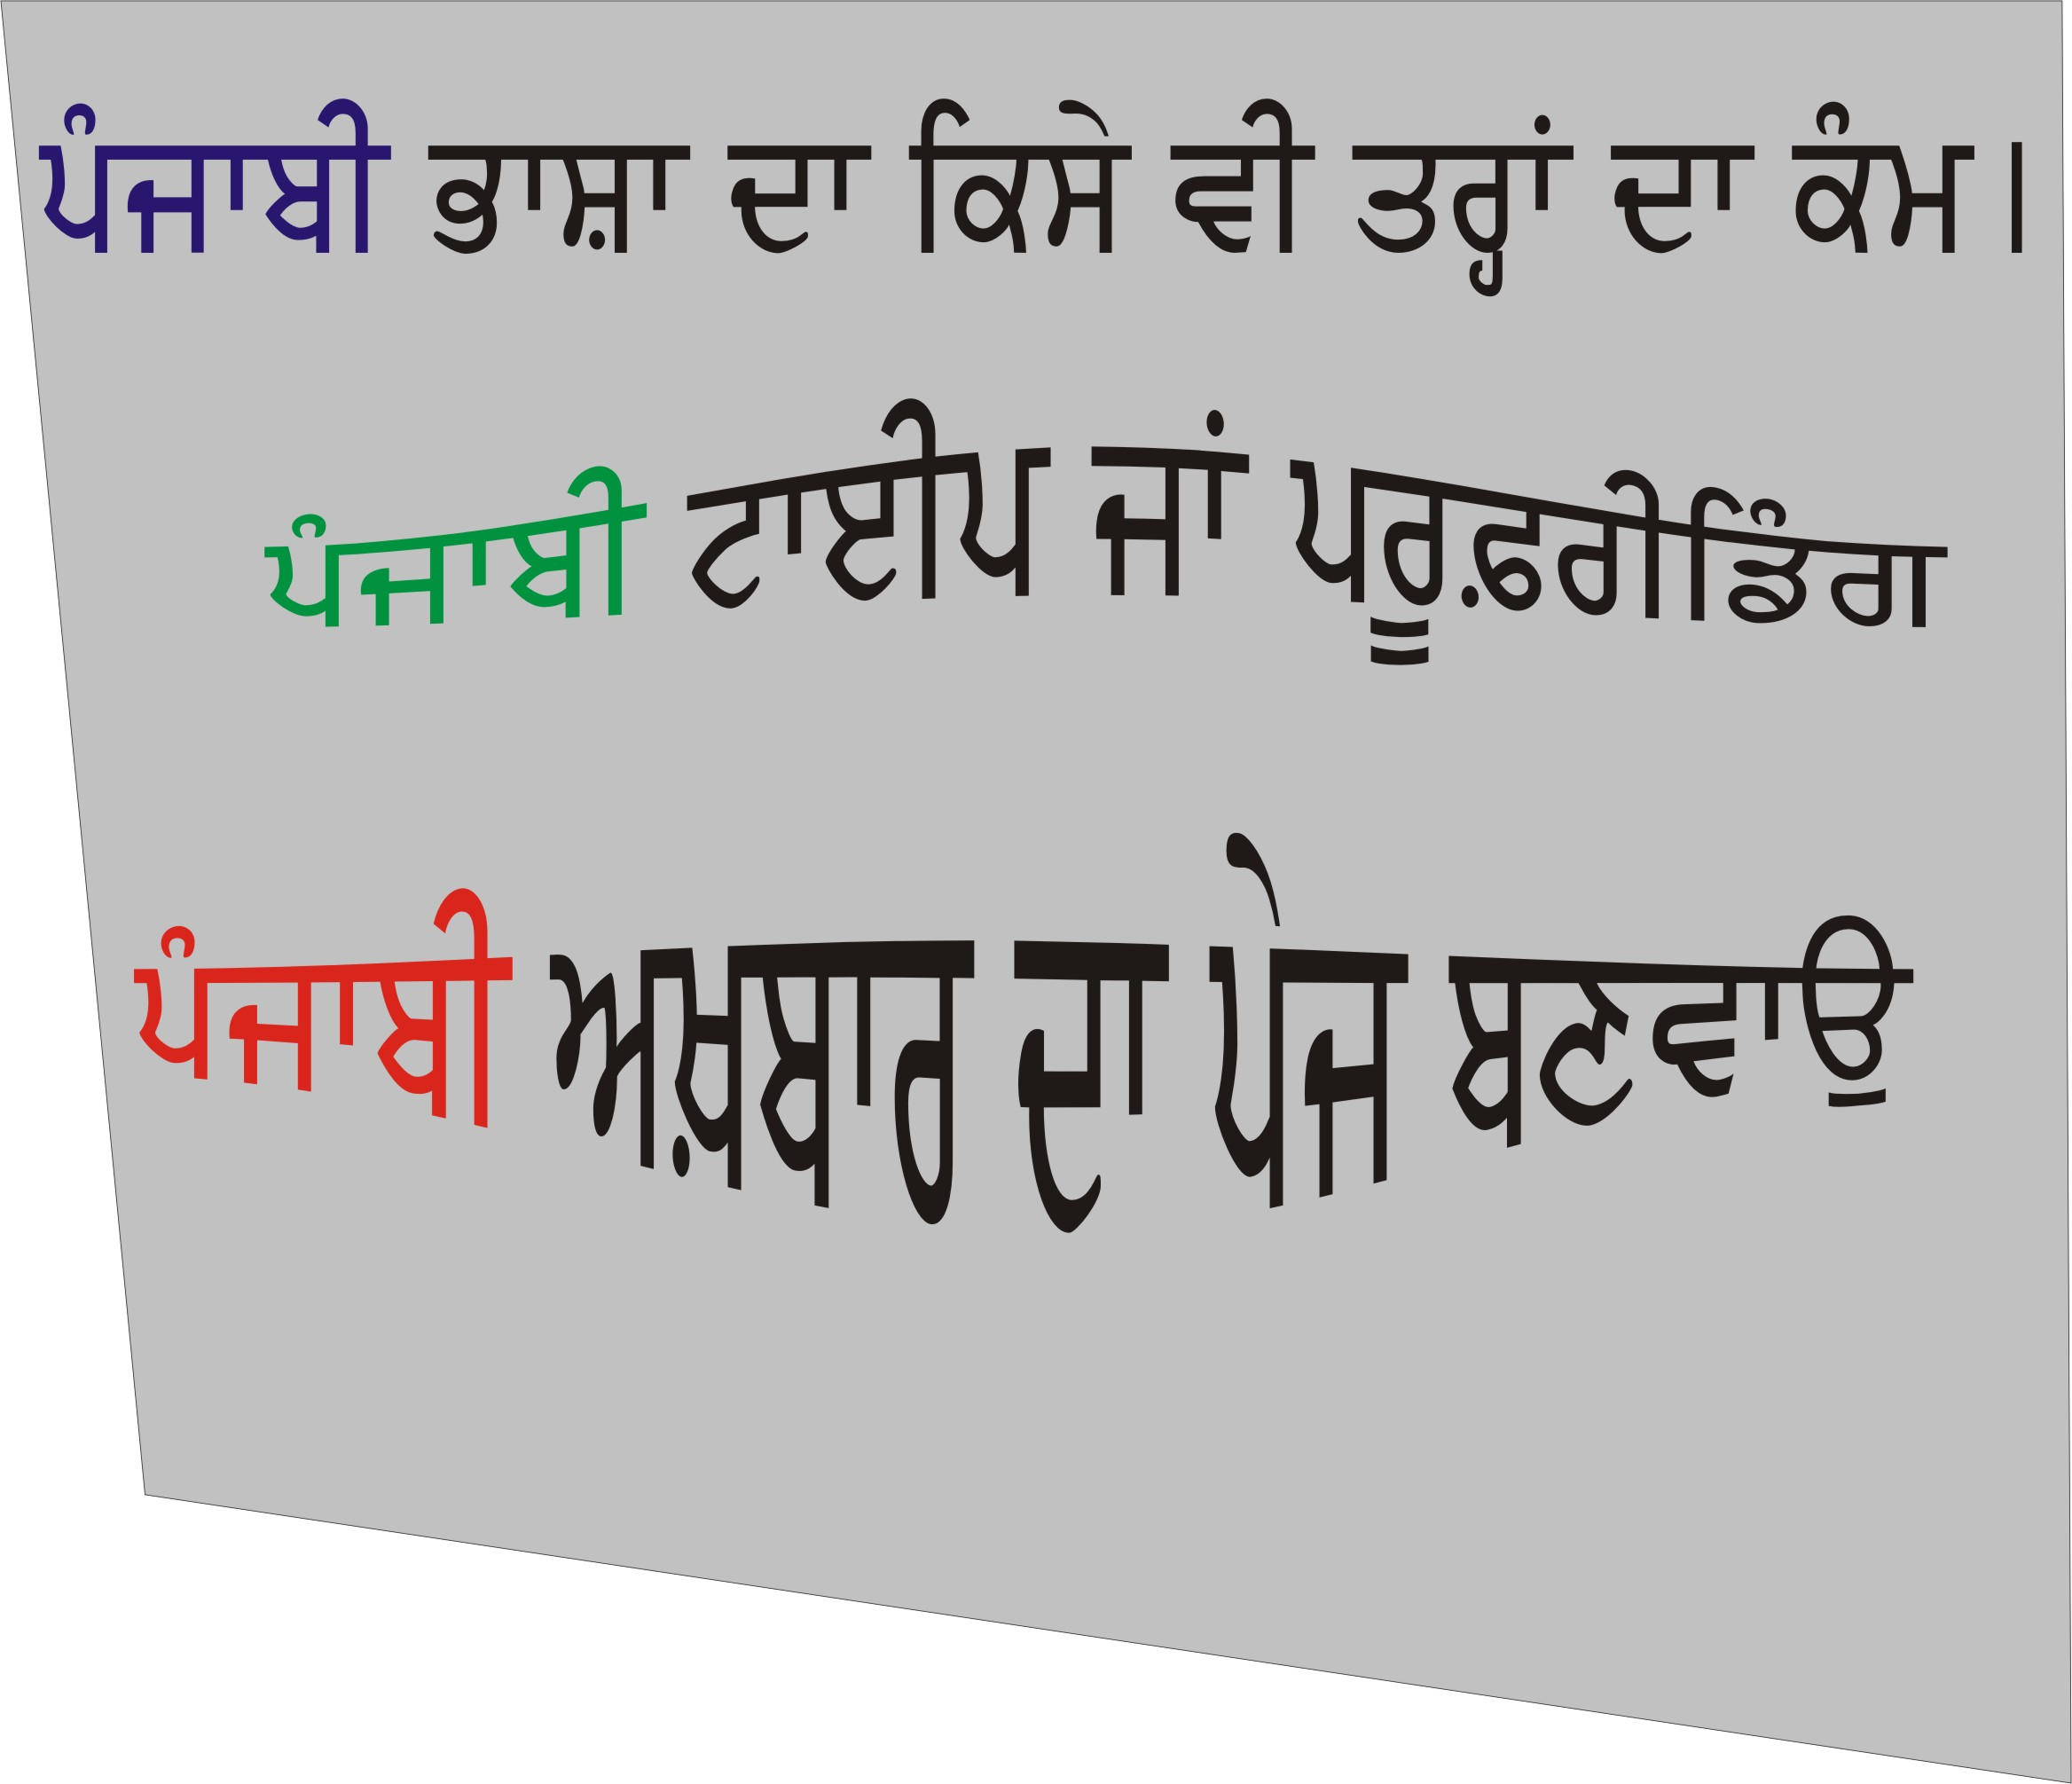 punjabi translator into punjabi language